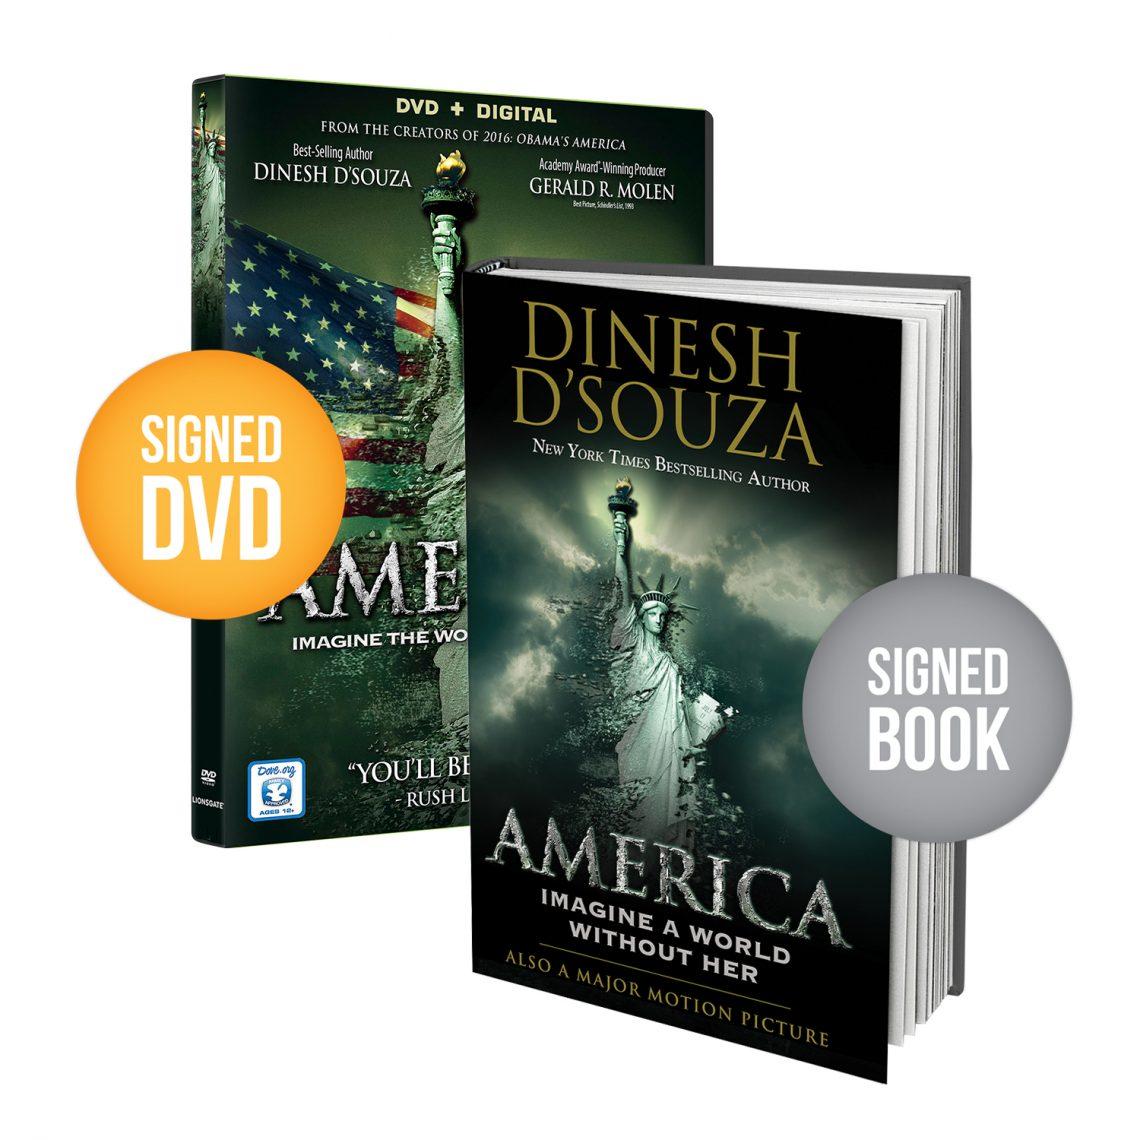 signed-america-book-signed-america-dvd